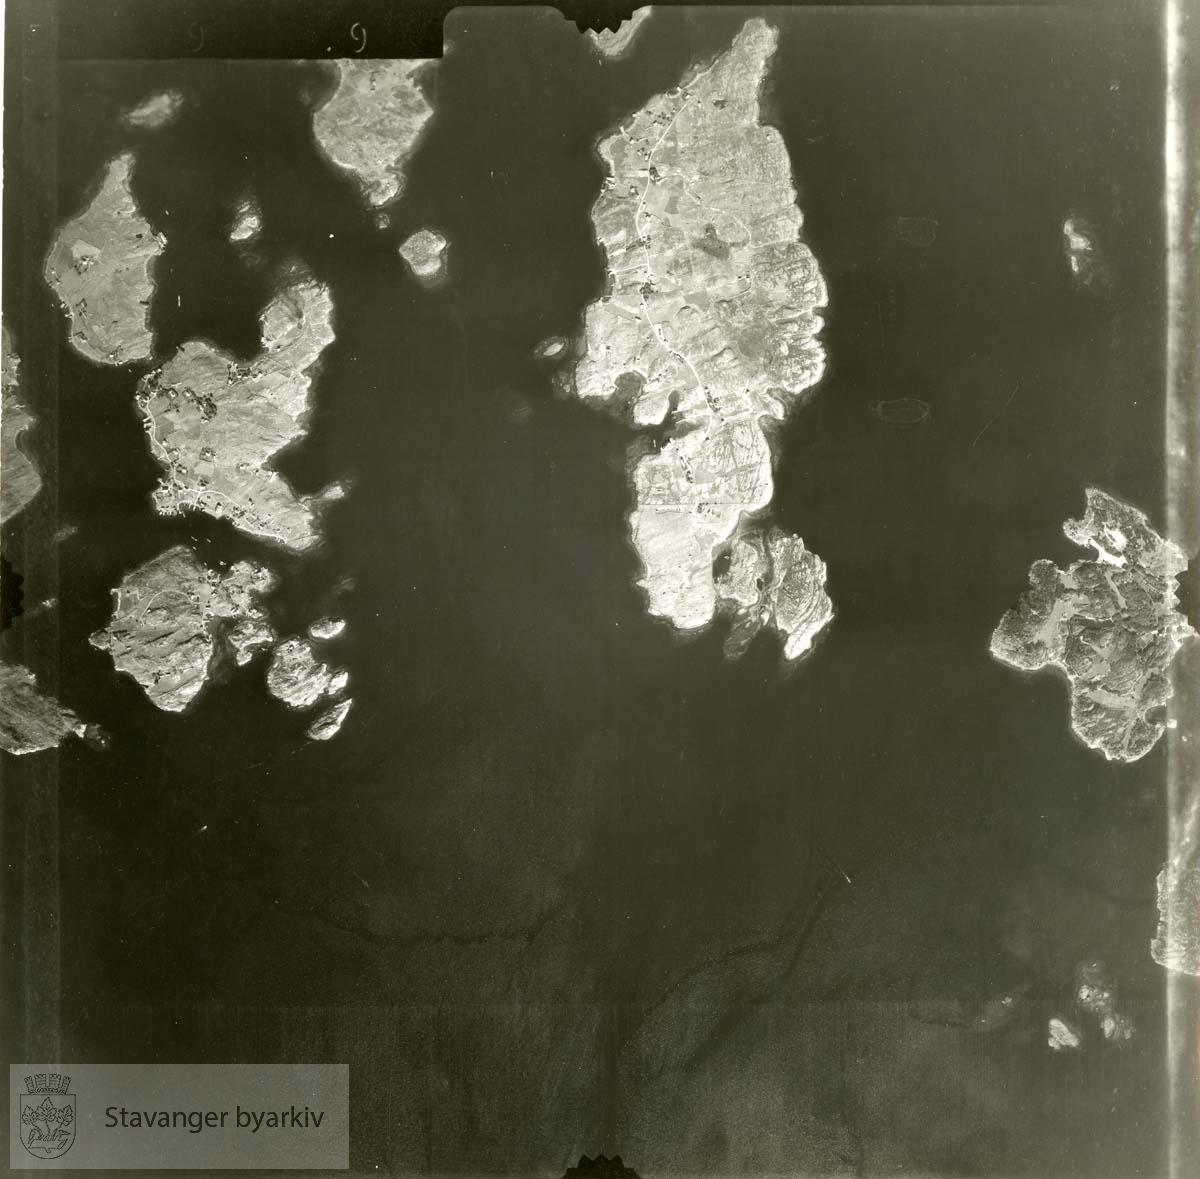 Jfr. kart/fotoplan G29/599..Ormøy, Roaldsøy, Bjørnøy, Vassøy, Lindøy..Se ByStW_Uca_002 (kan lastes ned under fanen for kart på Stavangerbilder)